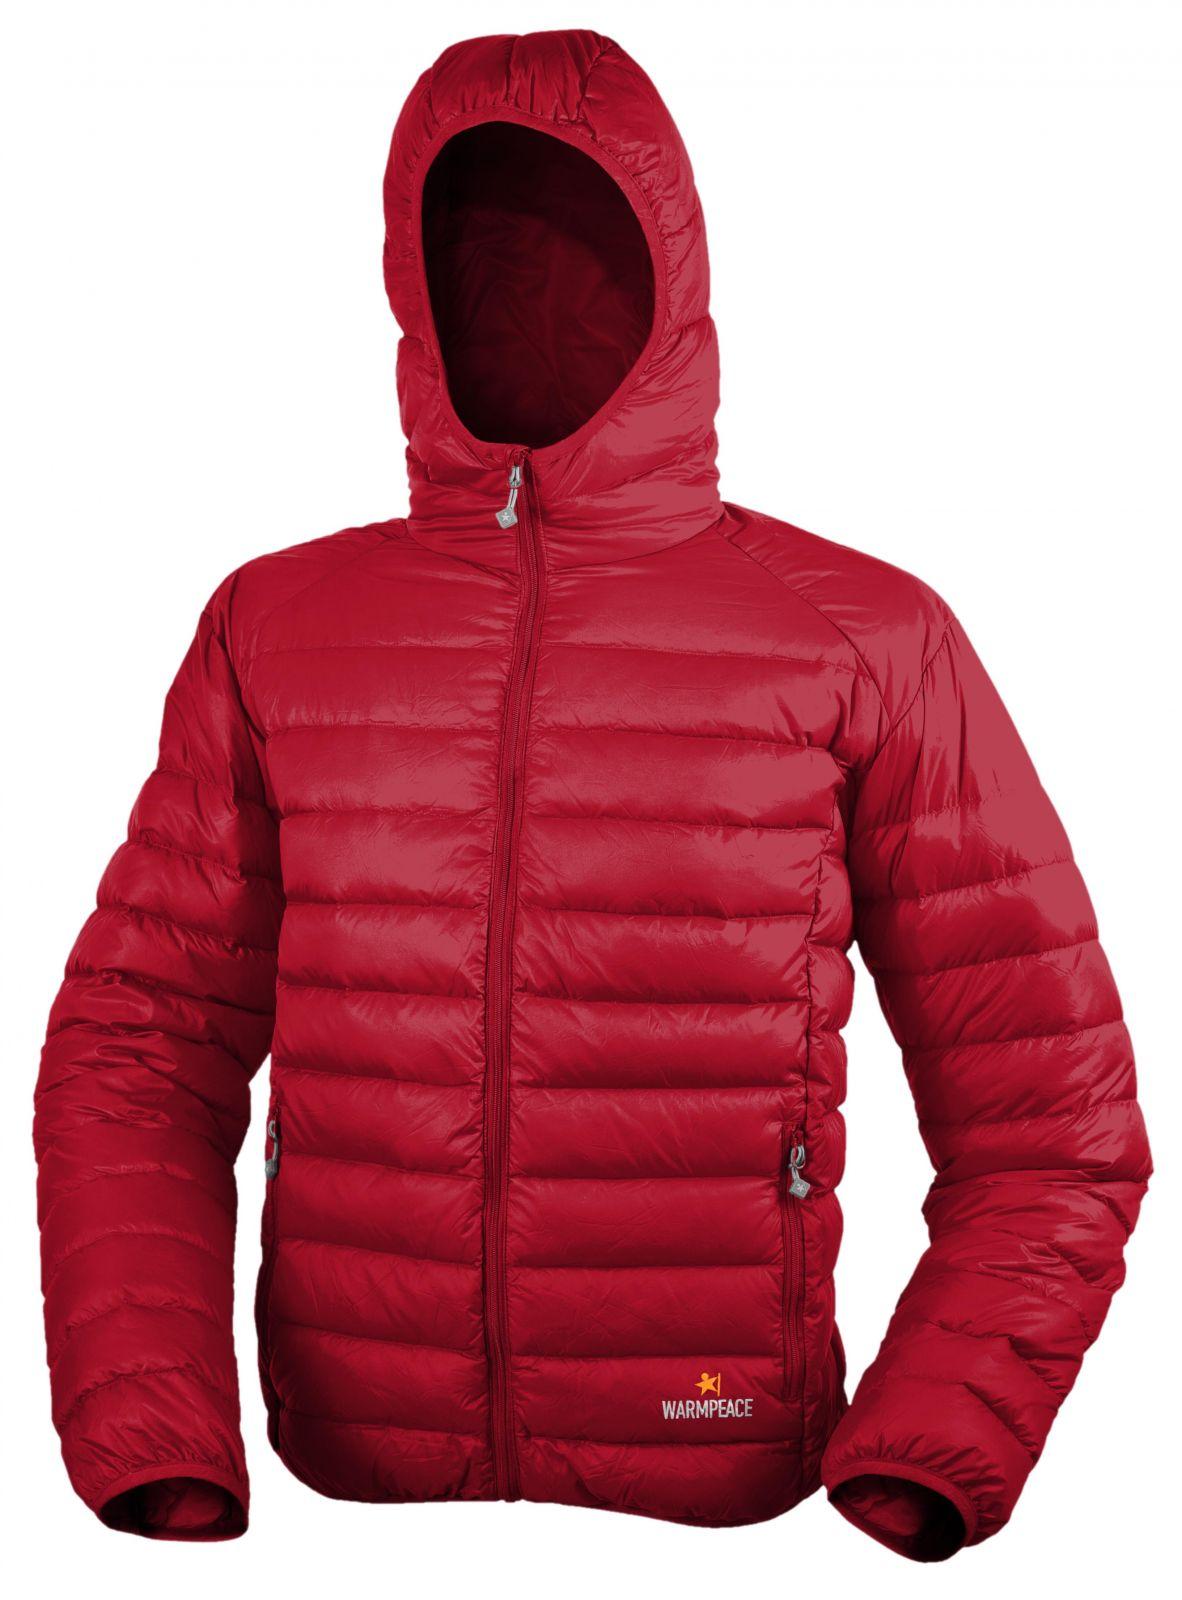 Warmpeace Nordvik red péřová bunda